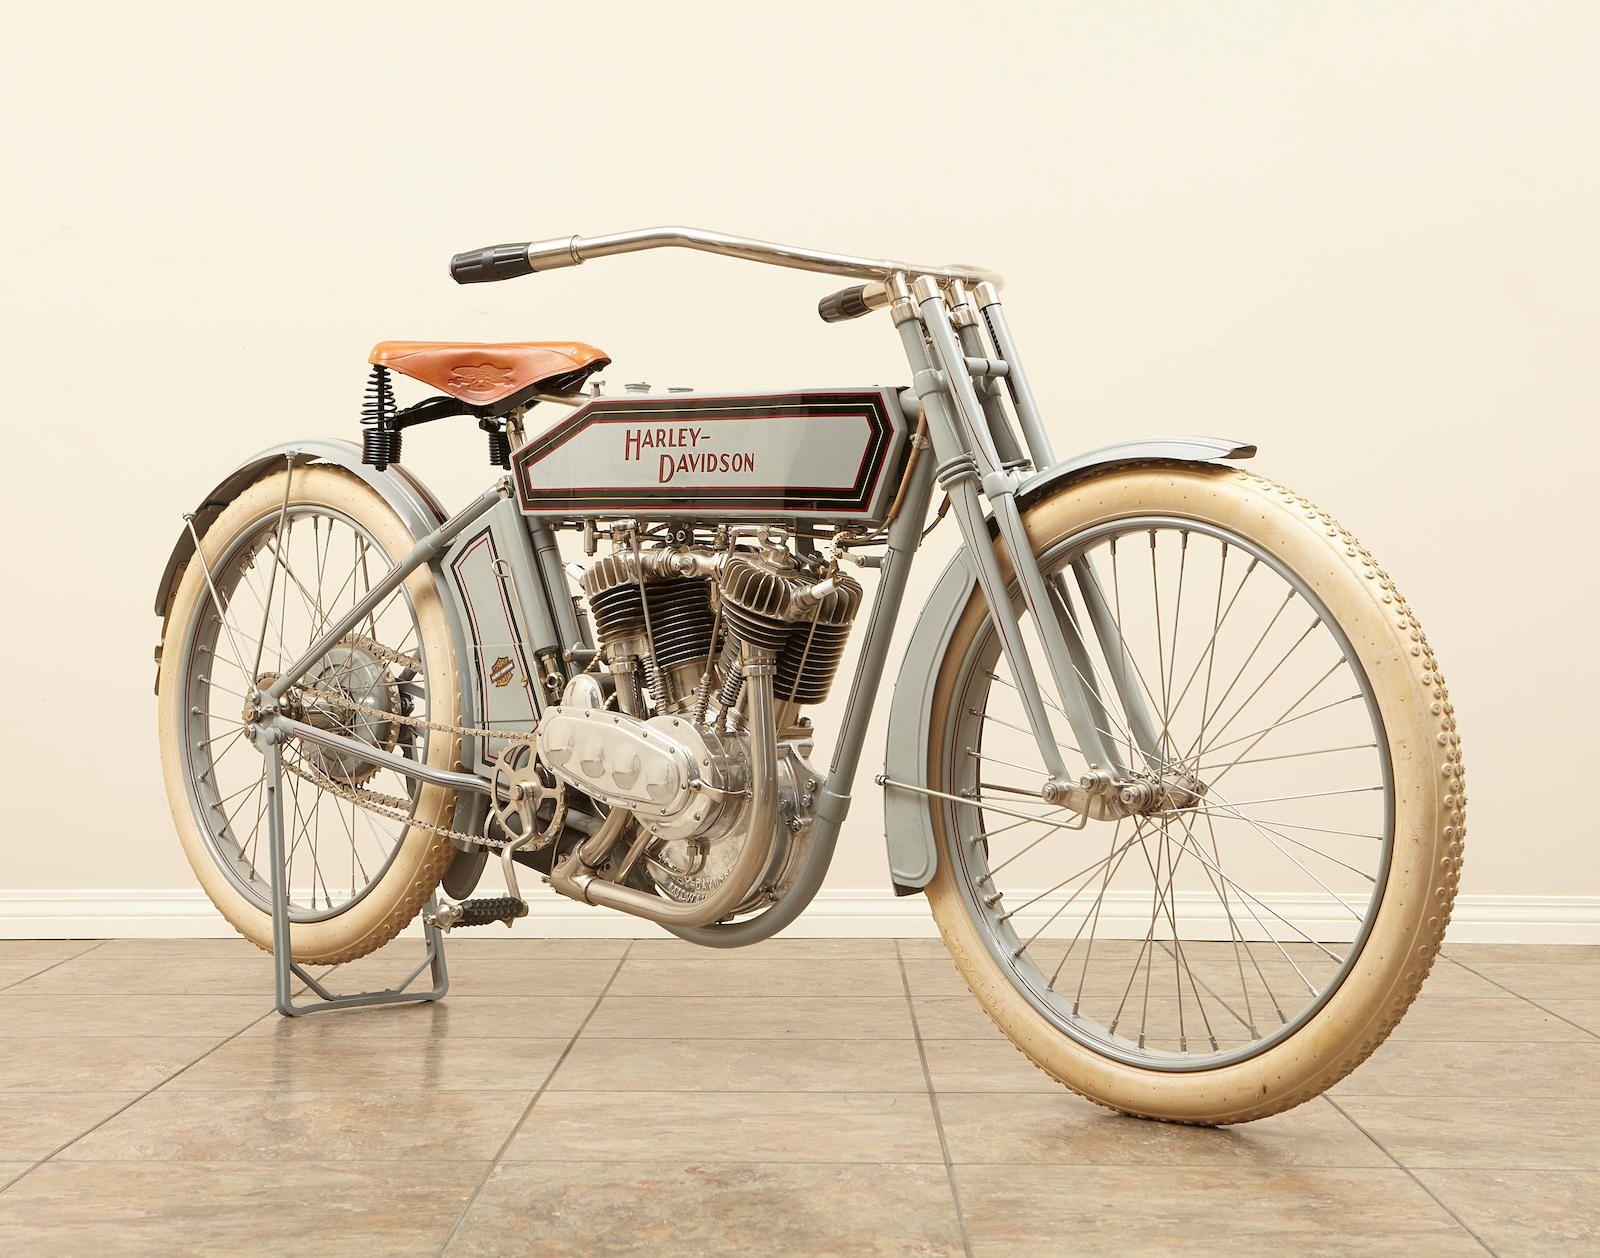 1912 Harley Davidson Twin Engine No 6163b Harley Davidson Model Harley Davidson History Harley